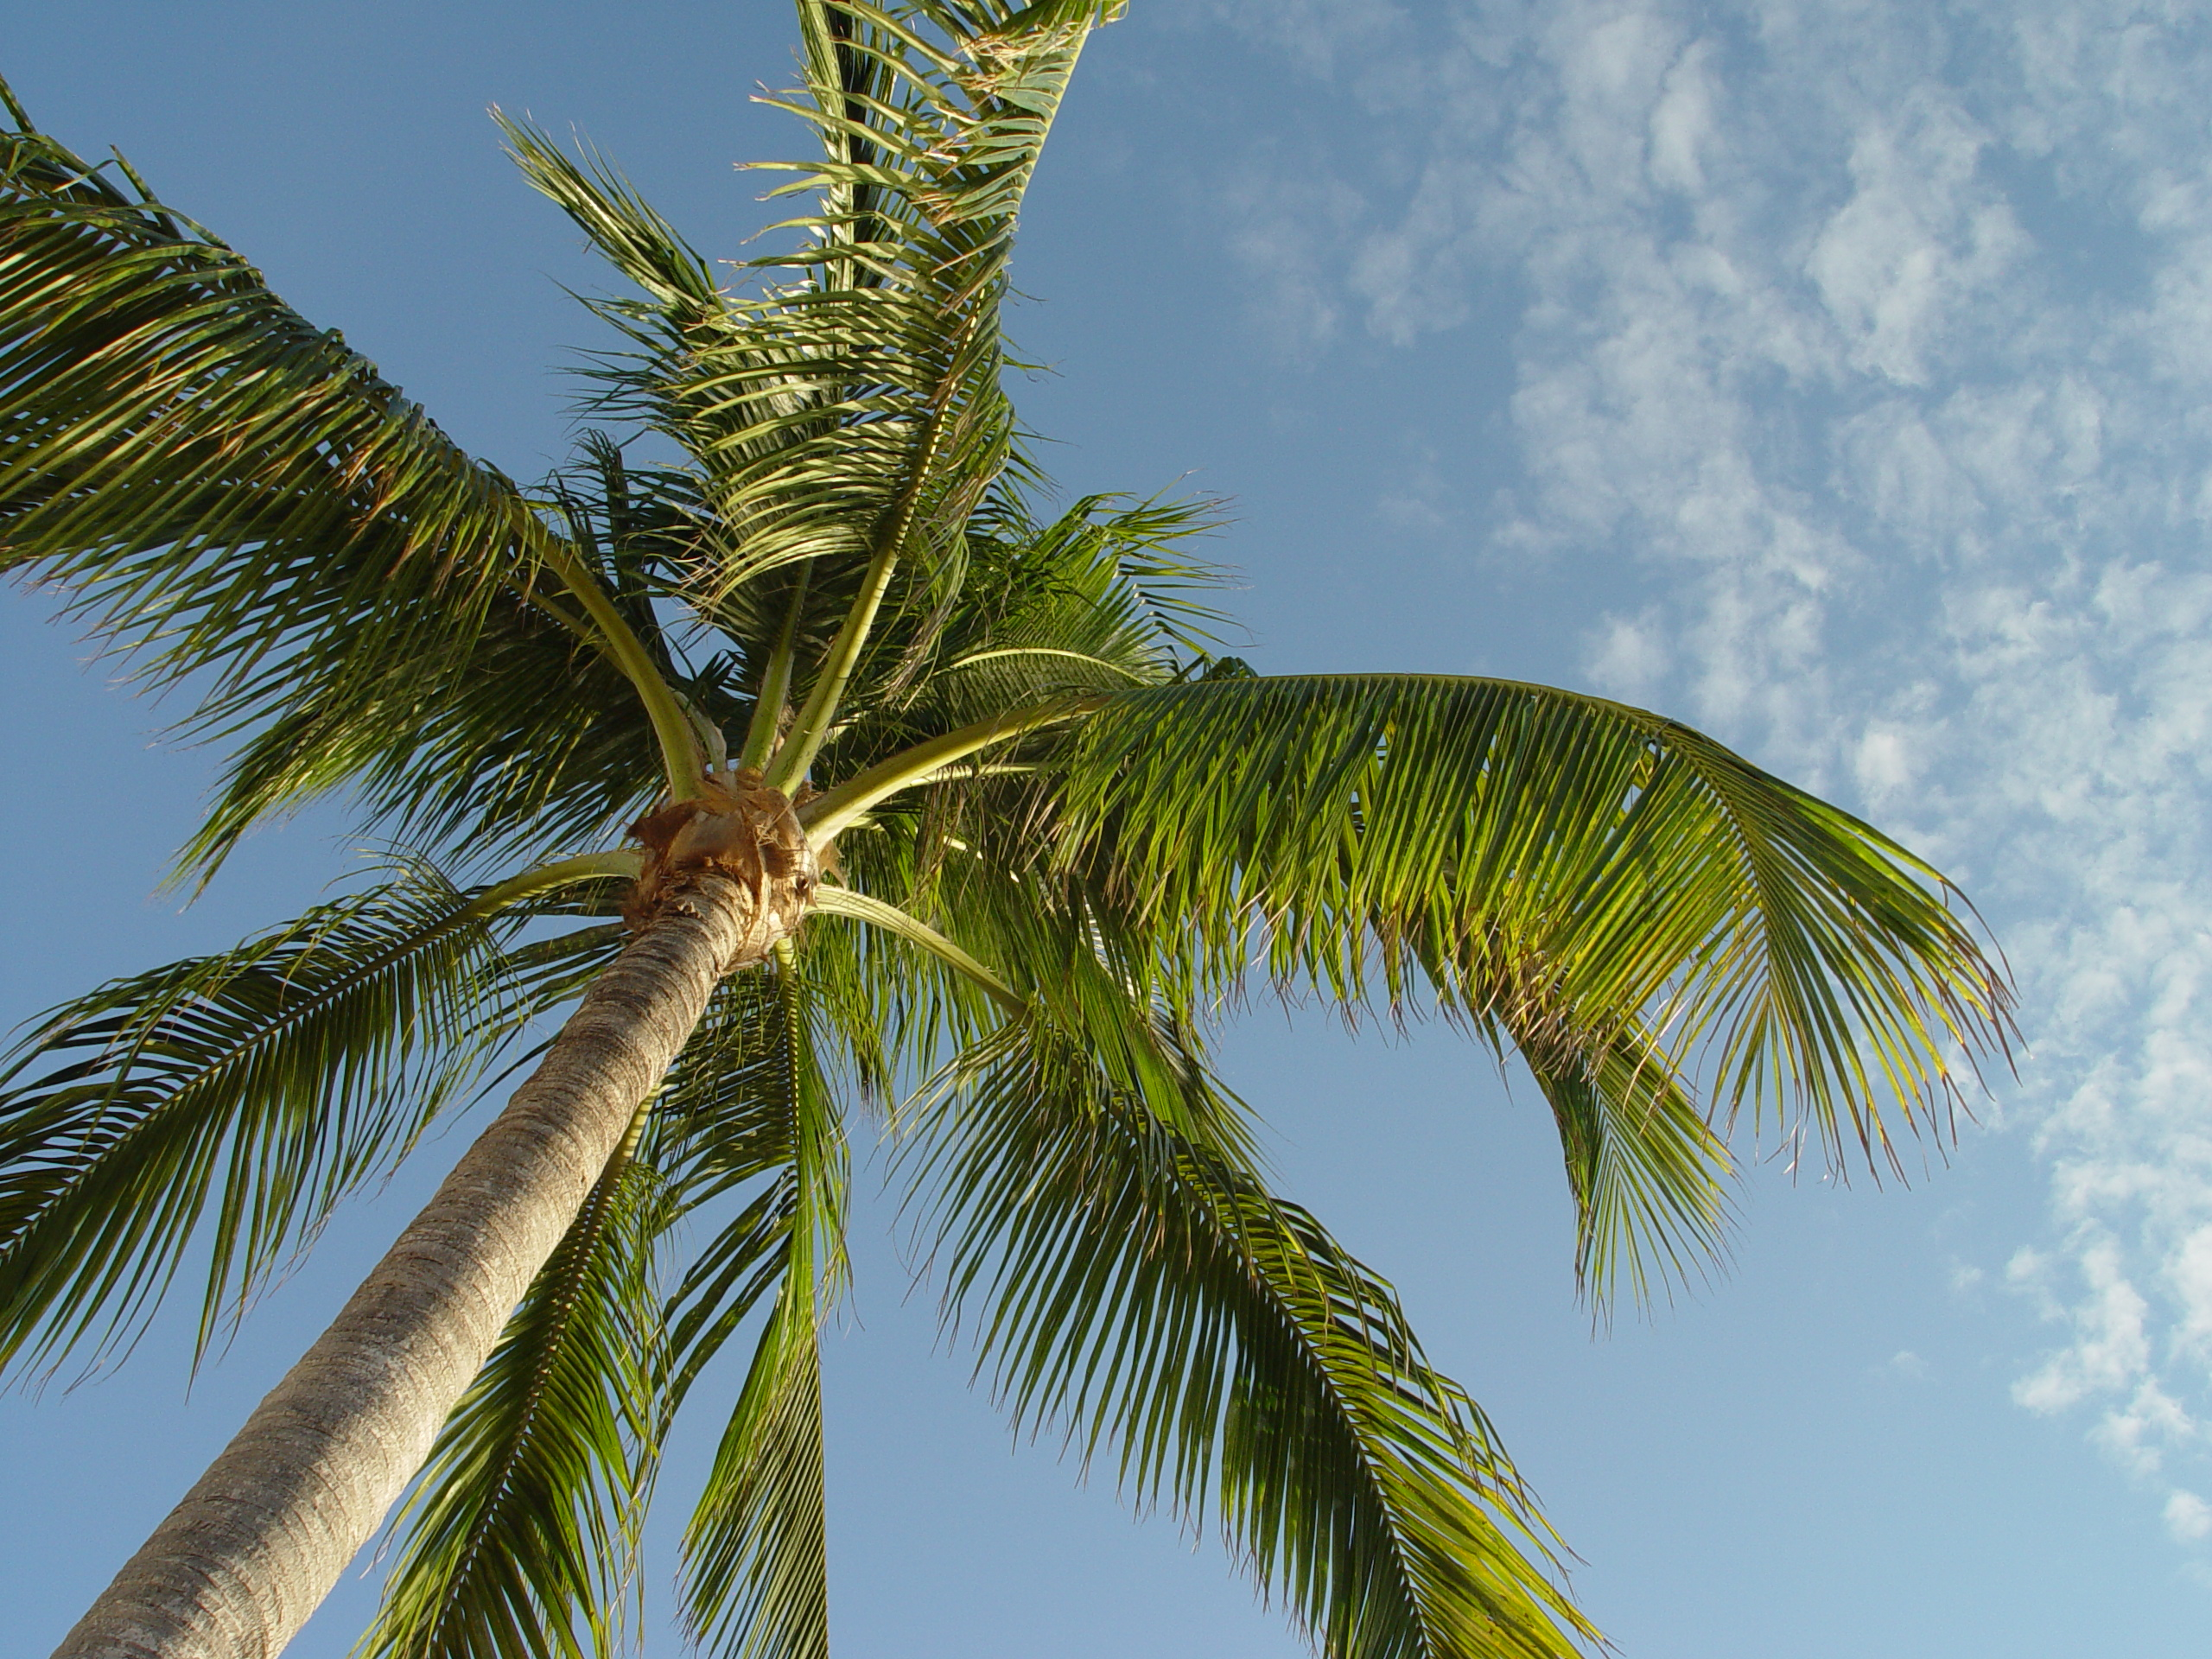 File:Under the palm tree (5889915132).jpg